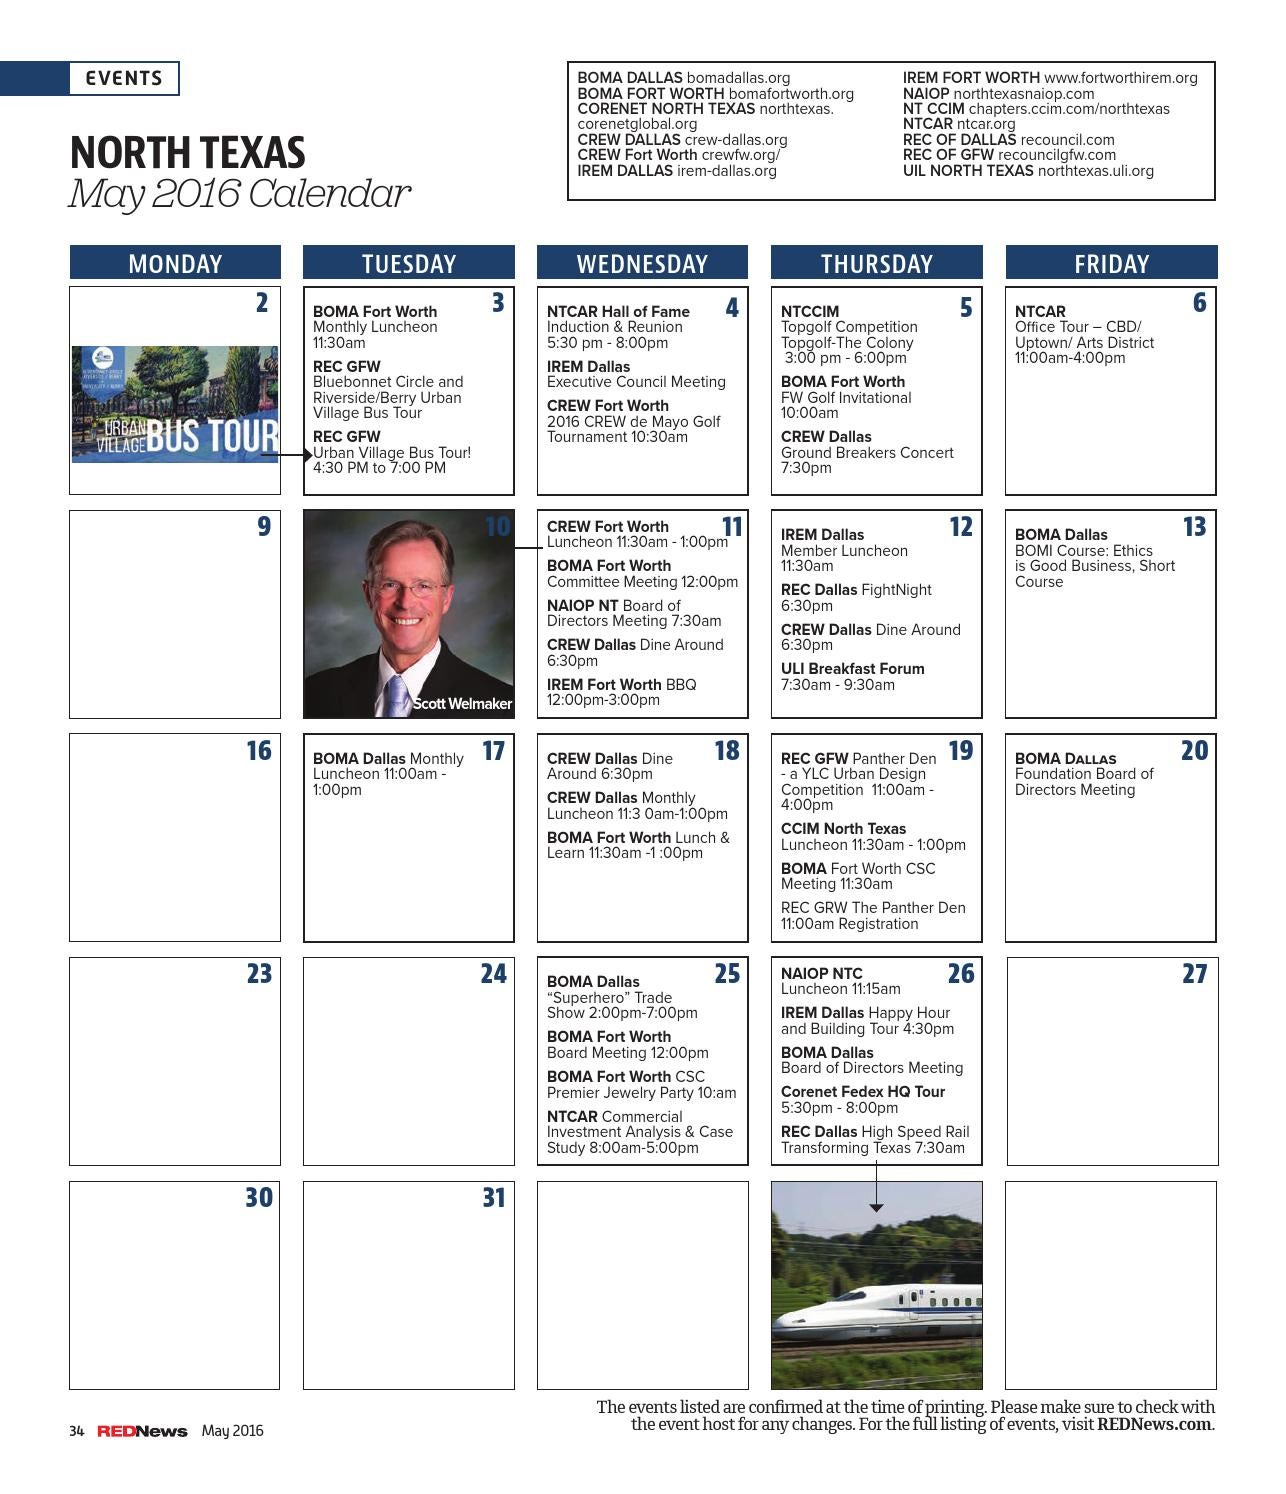 Rednews May 2016 North Texas